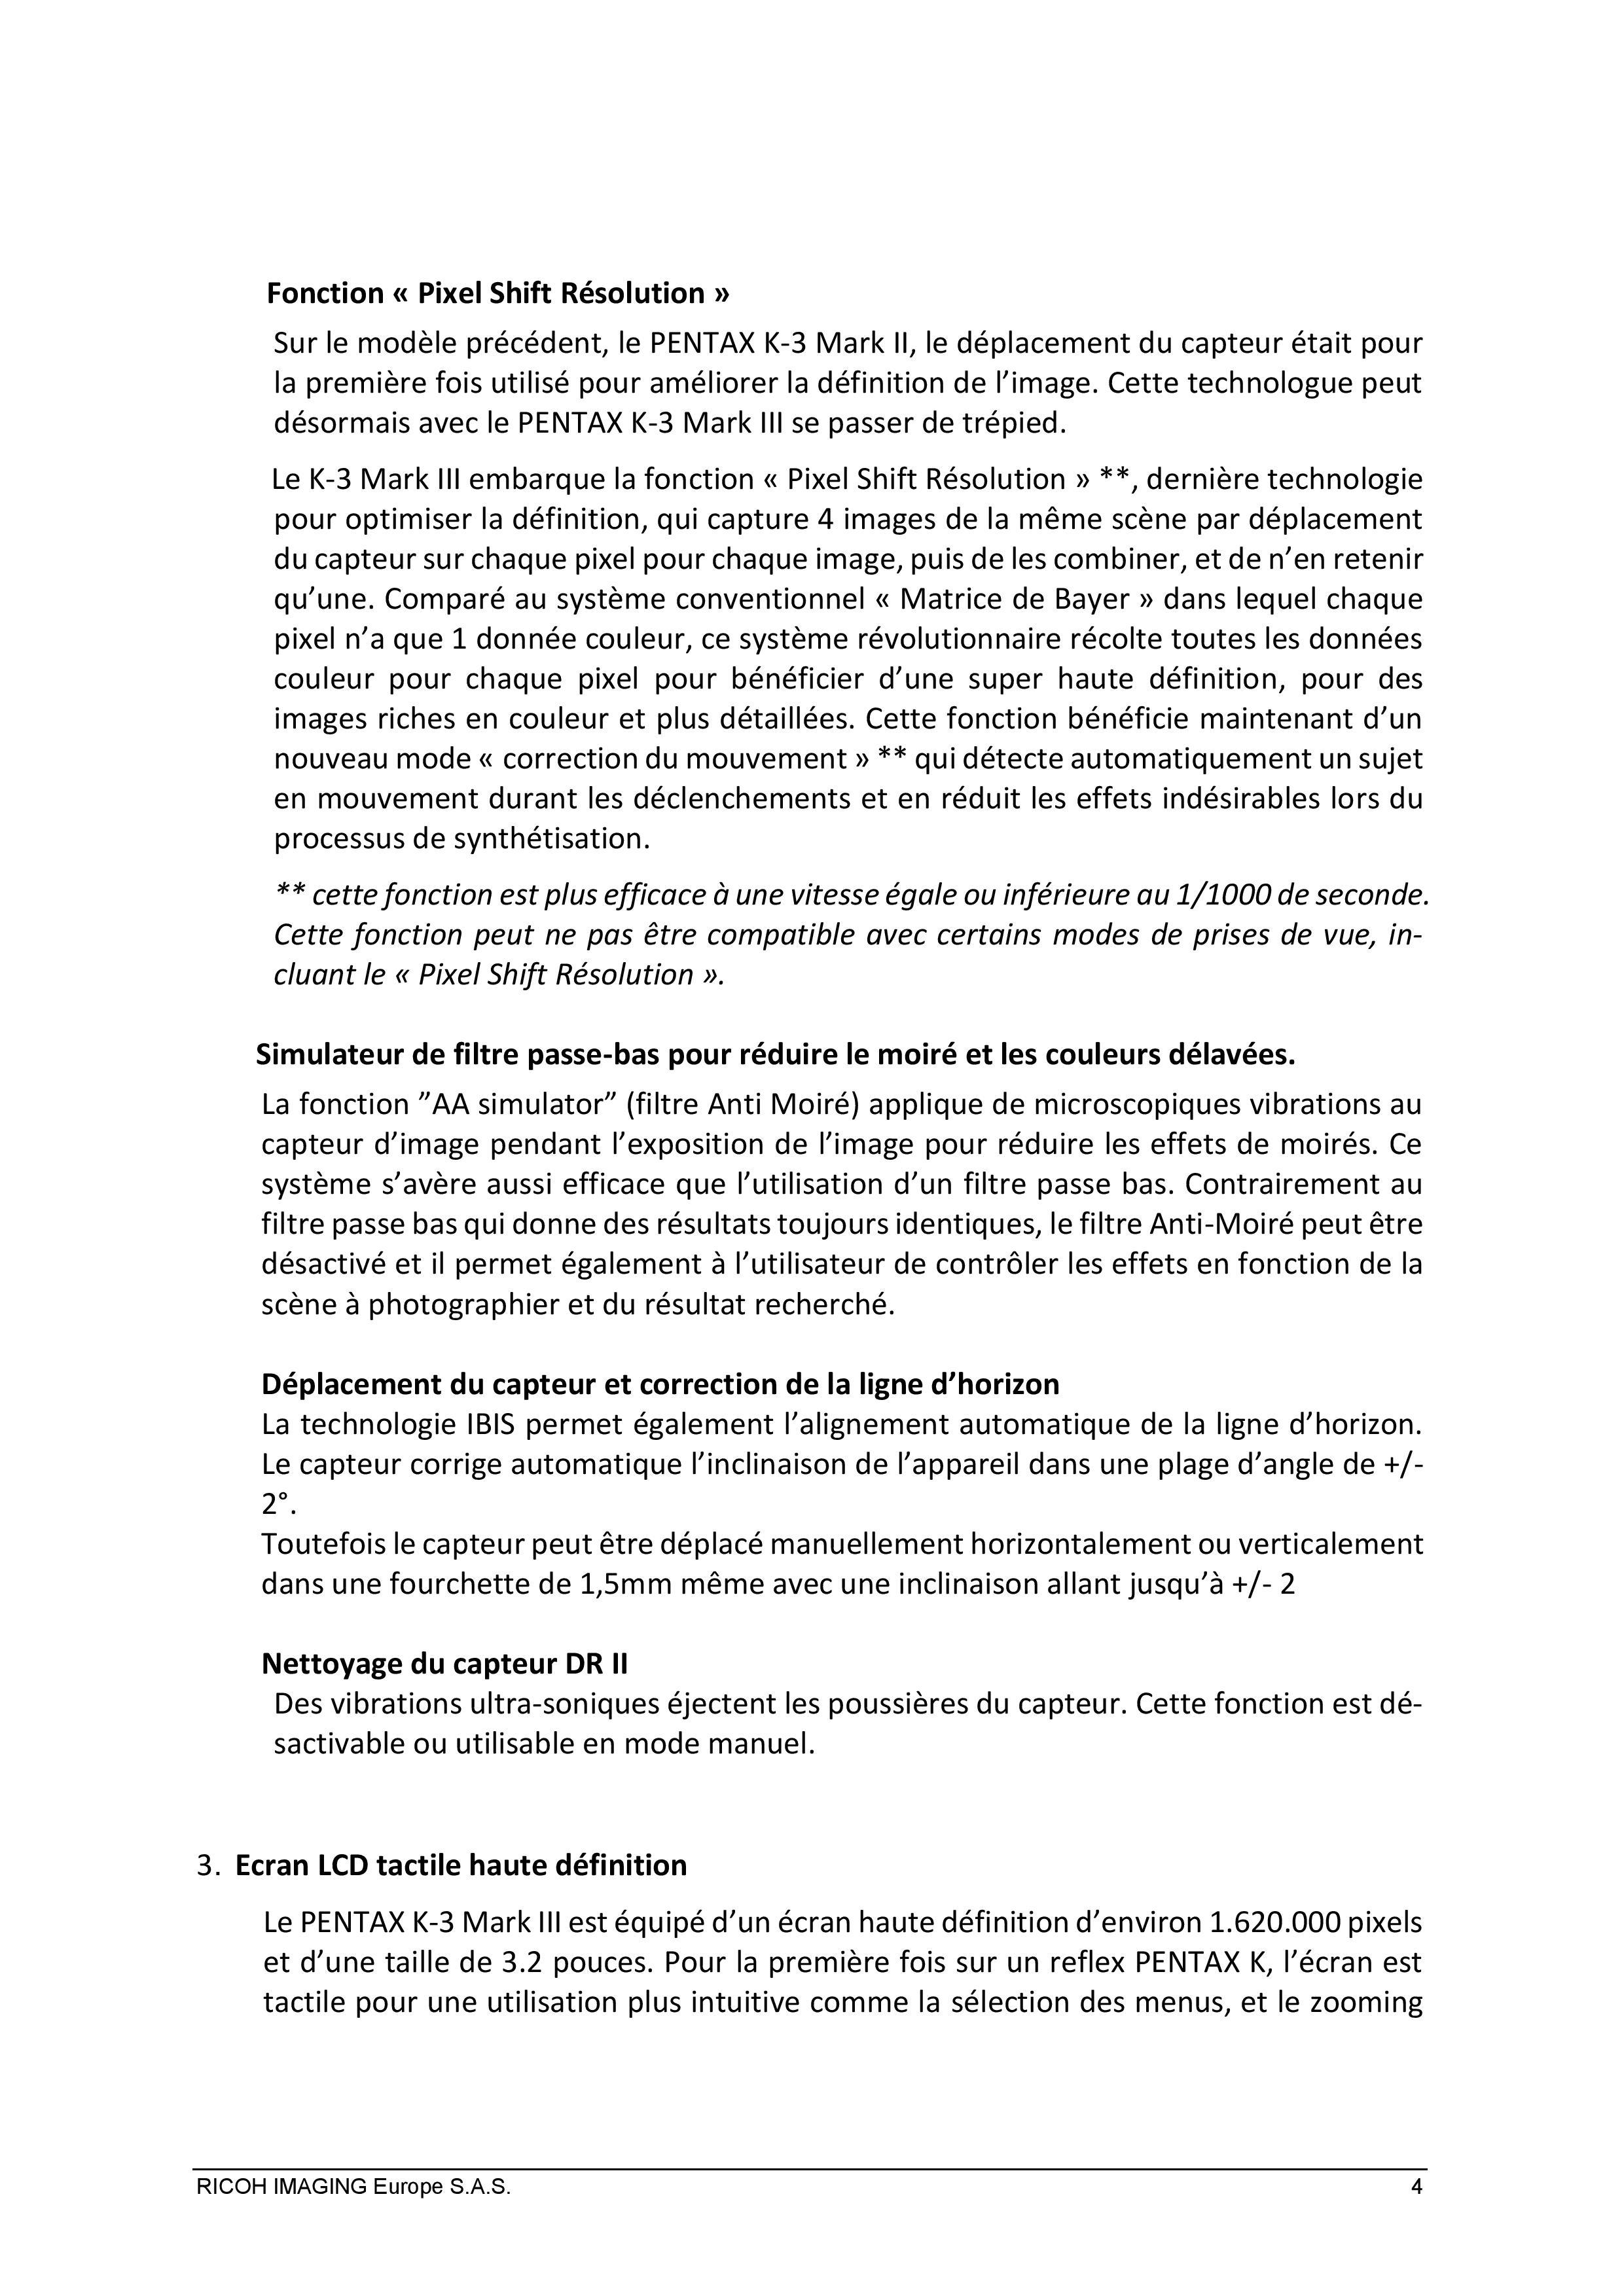 PENTAX RICOH IMAGING - Communiqué de presse du K3 Mark III 21033103141823142217344185